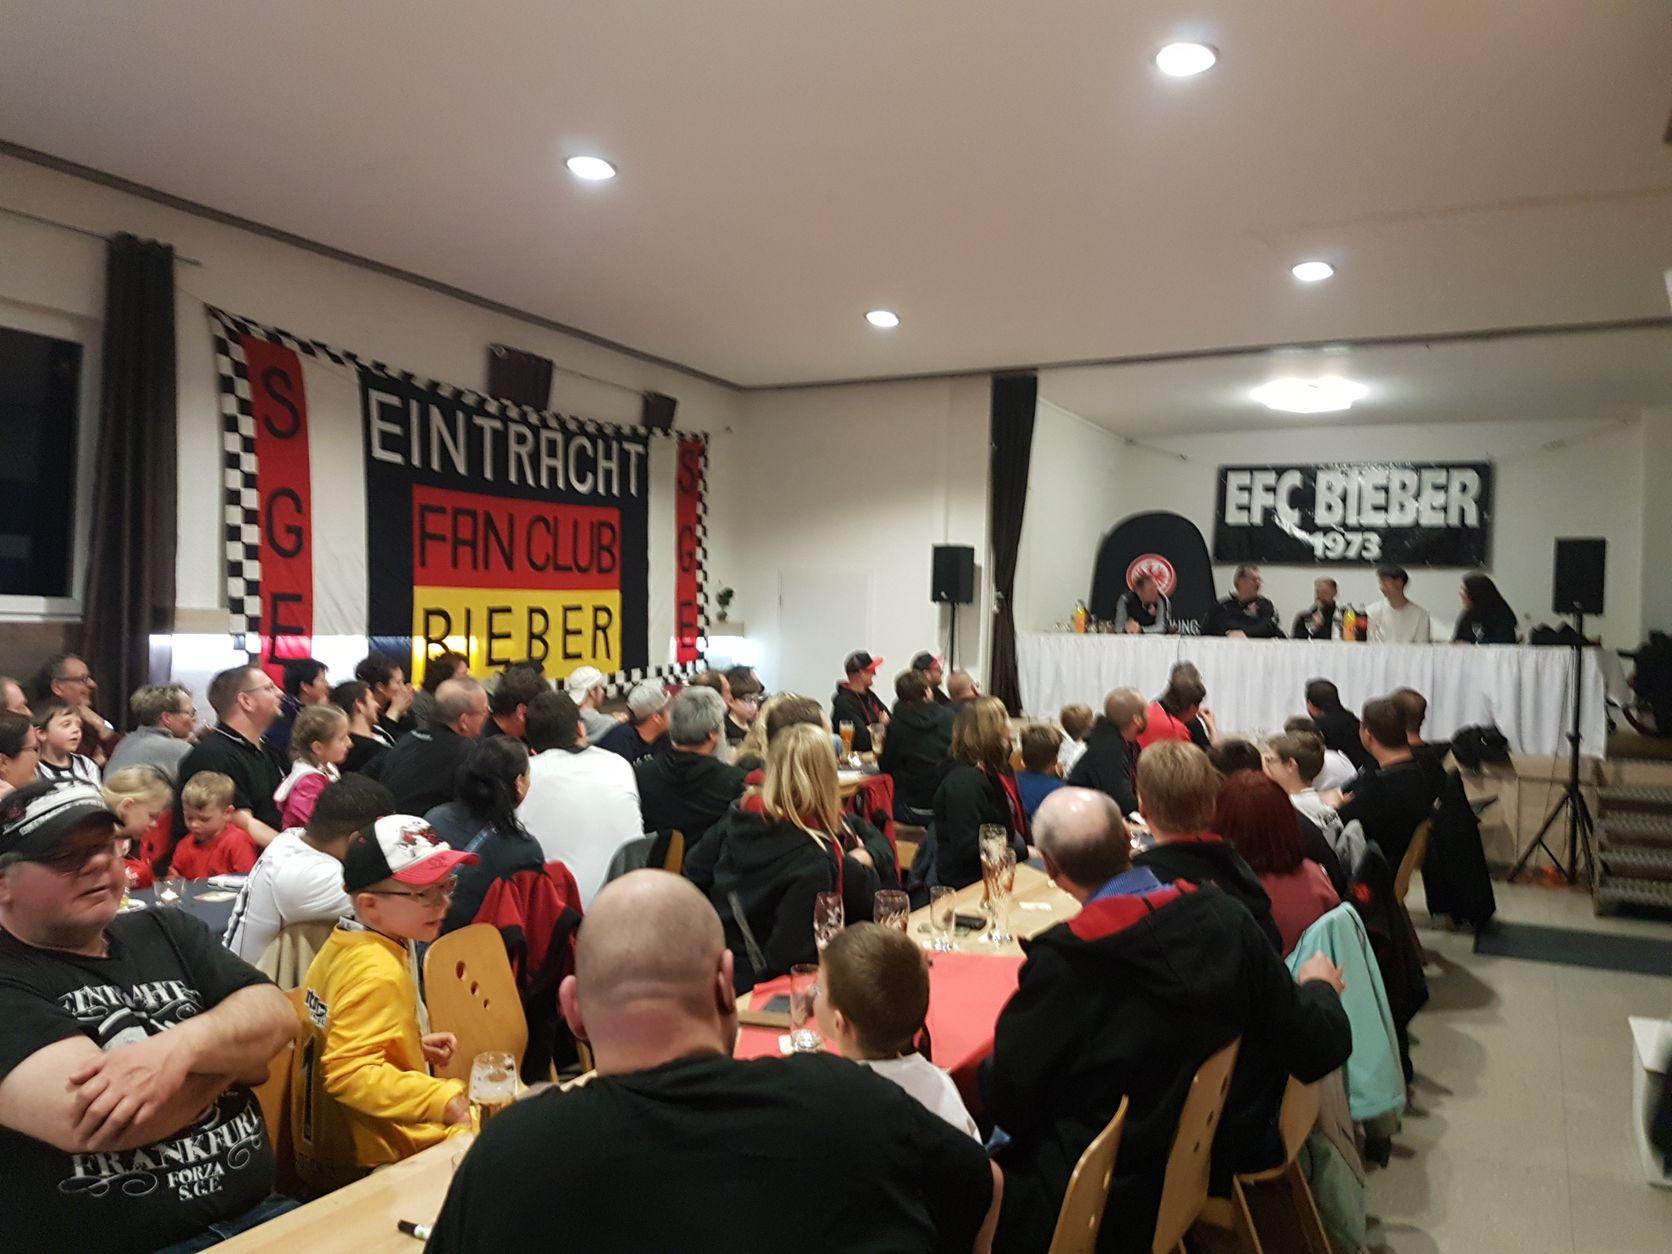 Eintracht Fanclub